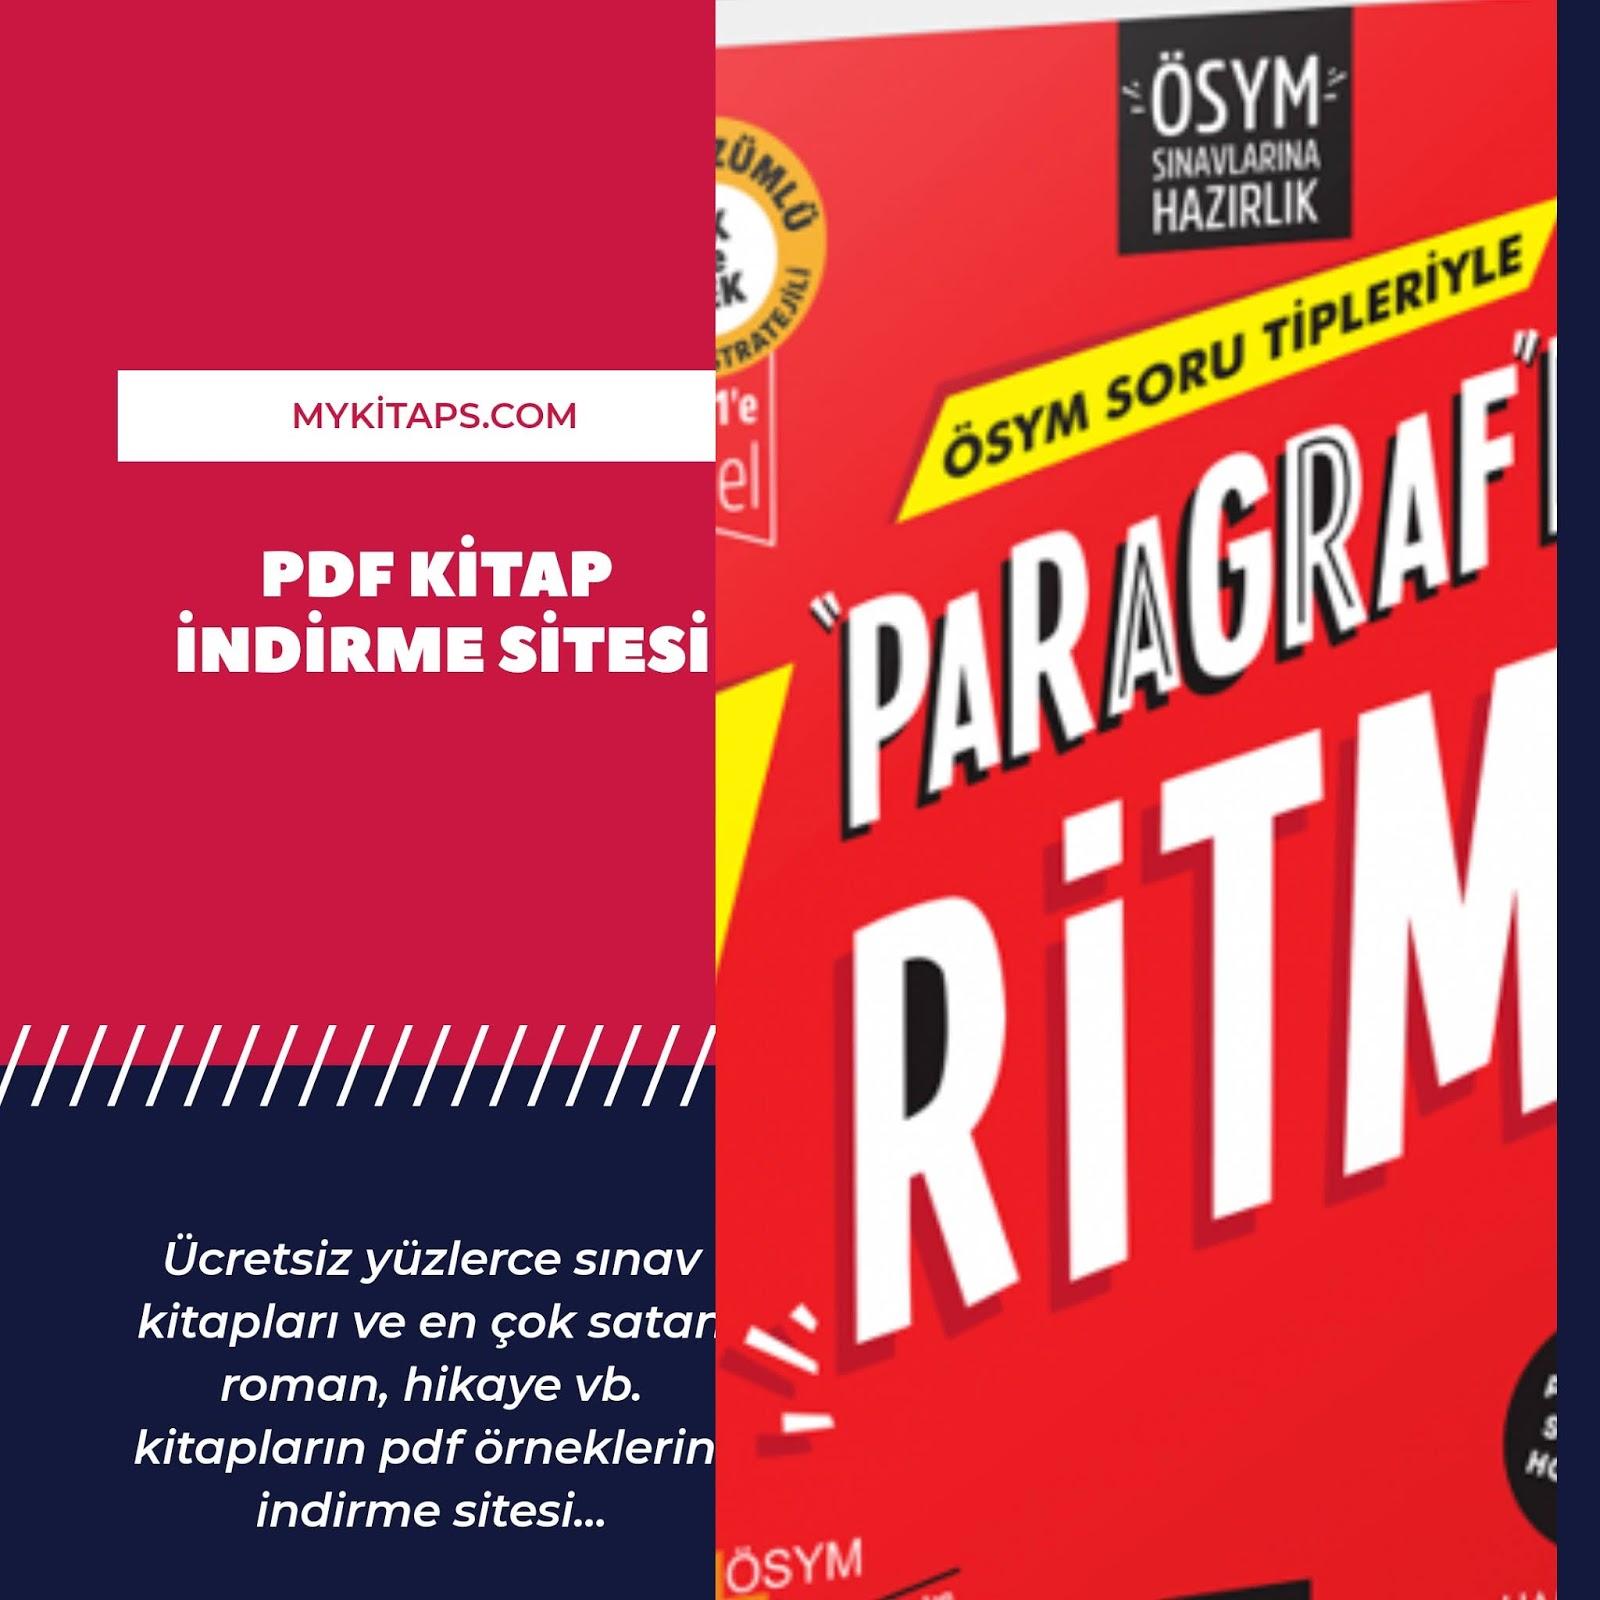 2021 Parargaf Soru Bankası PDF İndir - Parargafın Ritmi İndir - Arı Yayınları